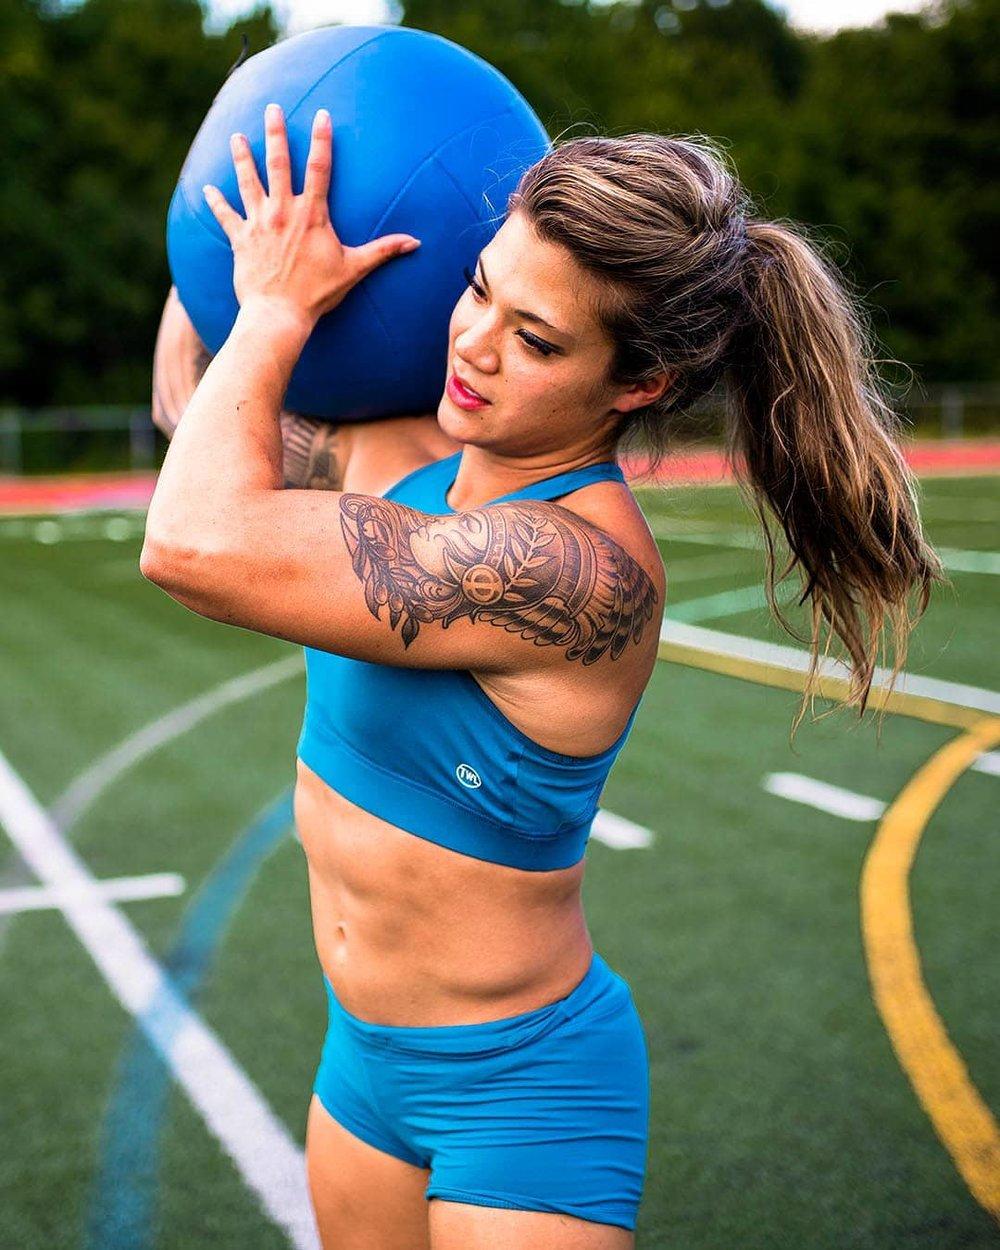 peoplemap-thewodlife-fitness-brands-on-instagram1.jpg